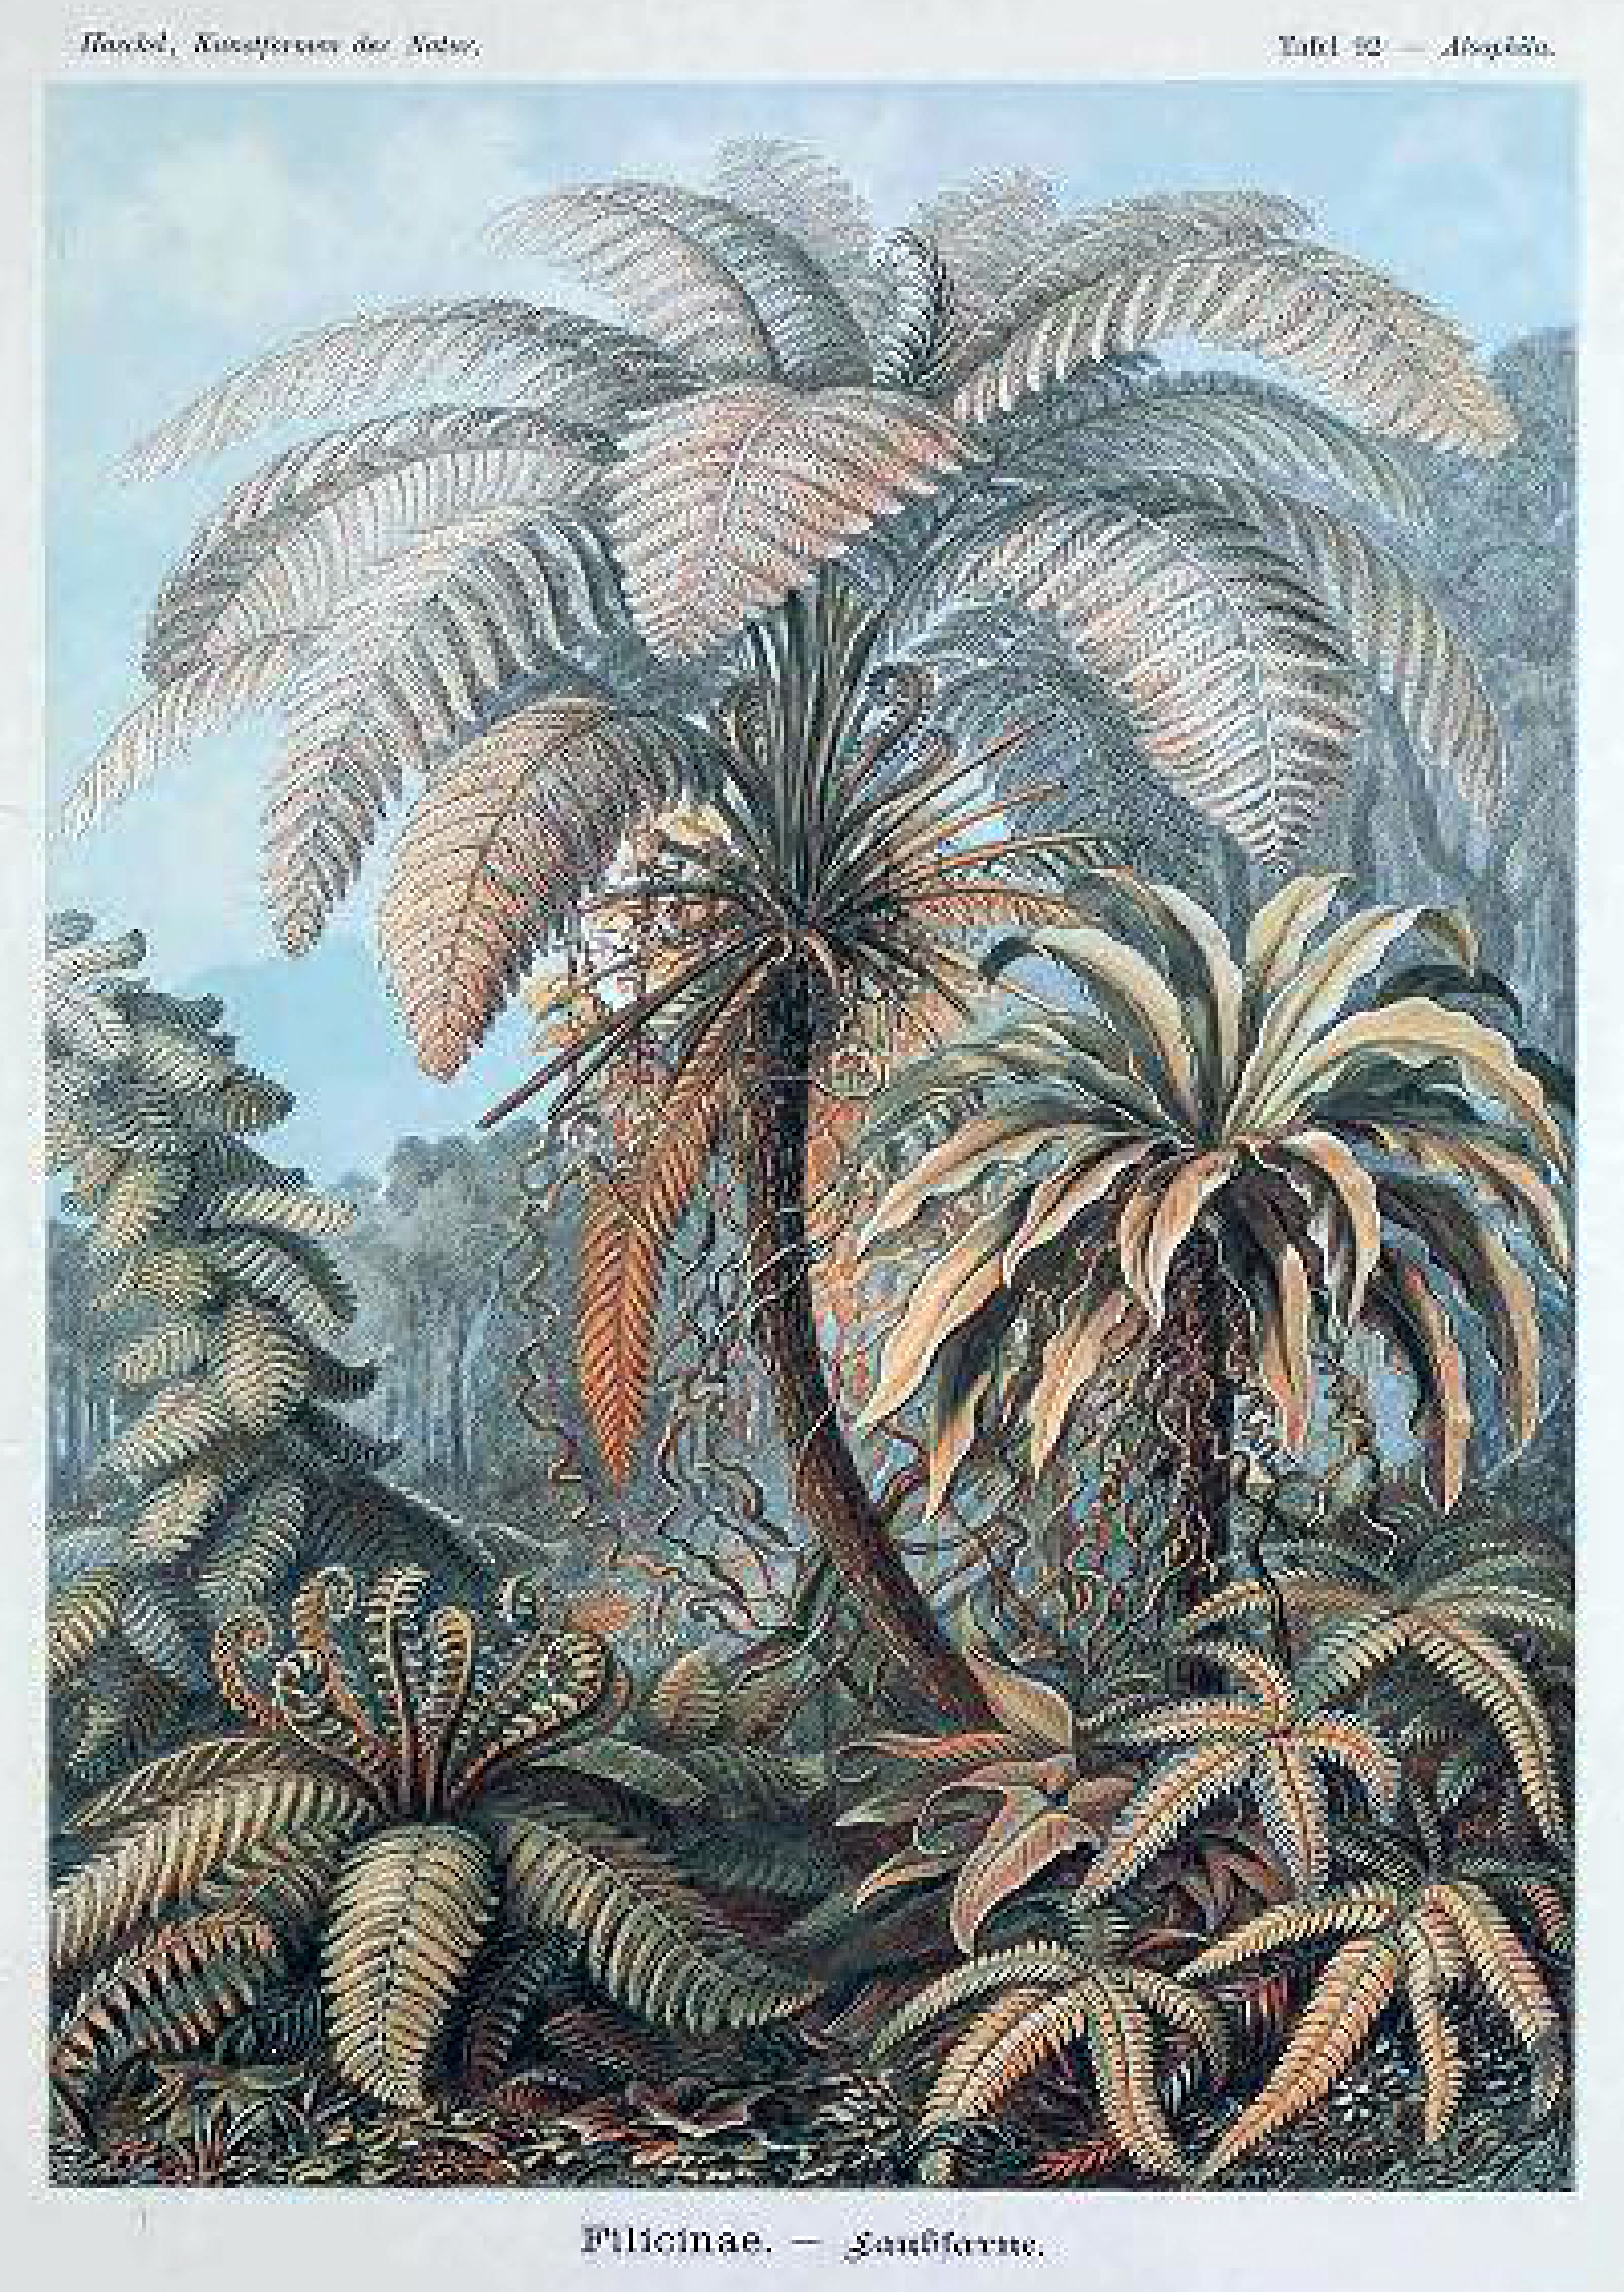 ernst haeckel illustrations filicinae fern